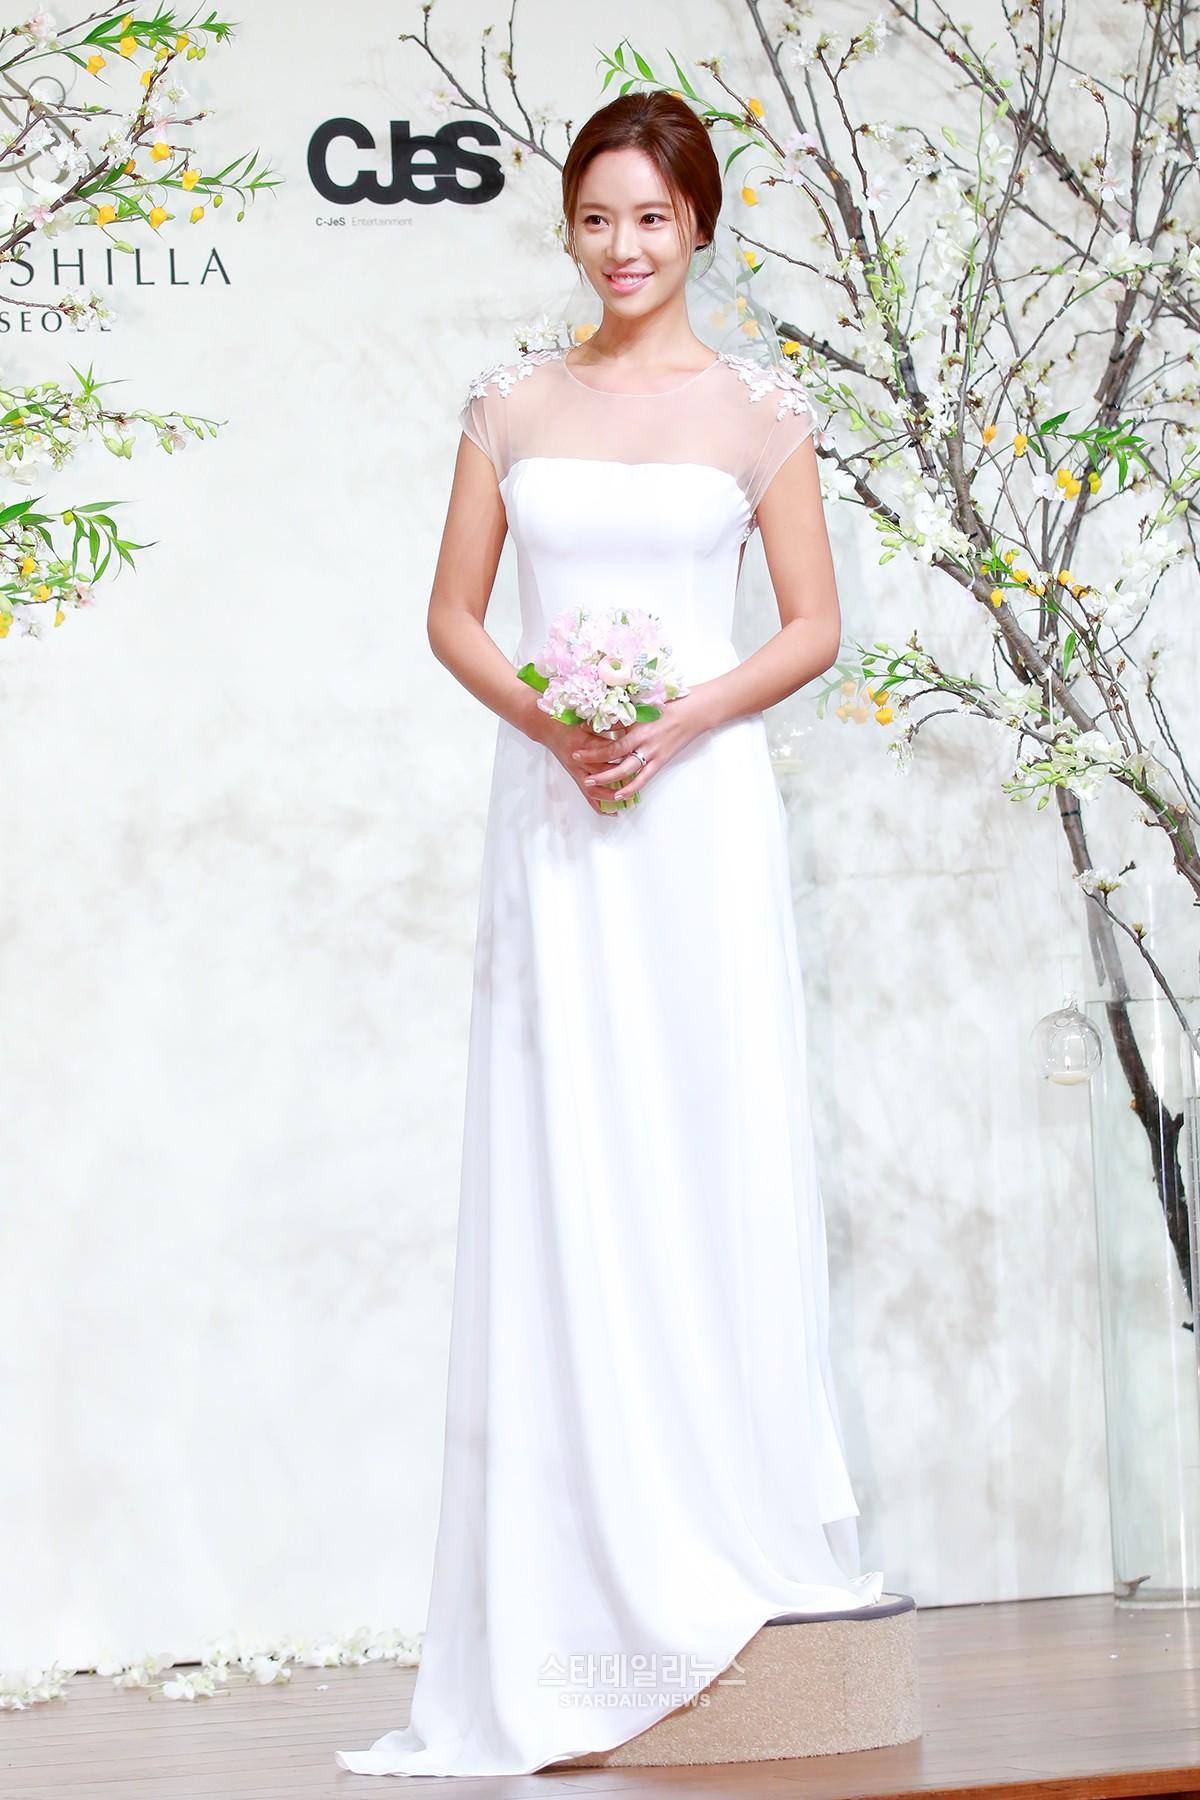 Hwang-Jun-Eum-wedding-star-daily-news-11